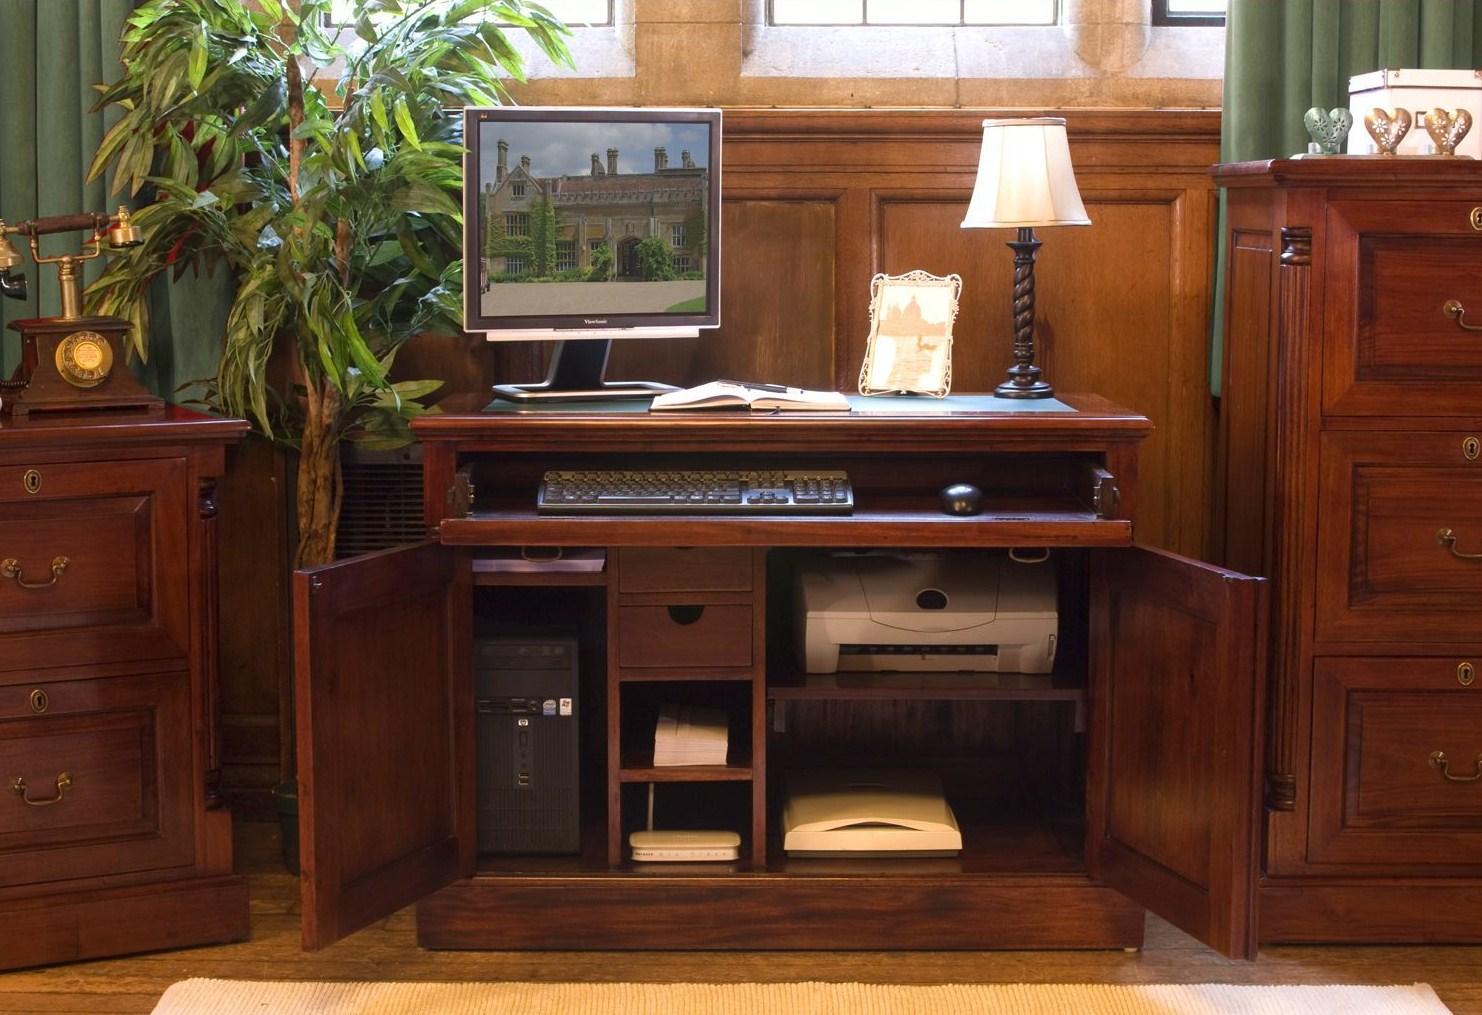 mahogany furnitures ... important facts and information about mahogany ward log home with tips MPNUXCF